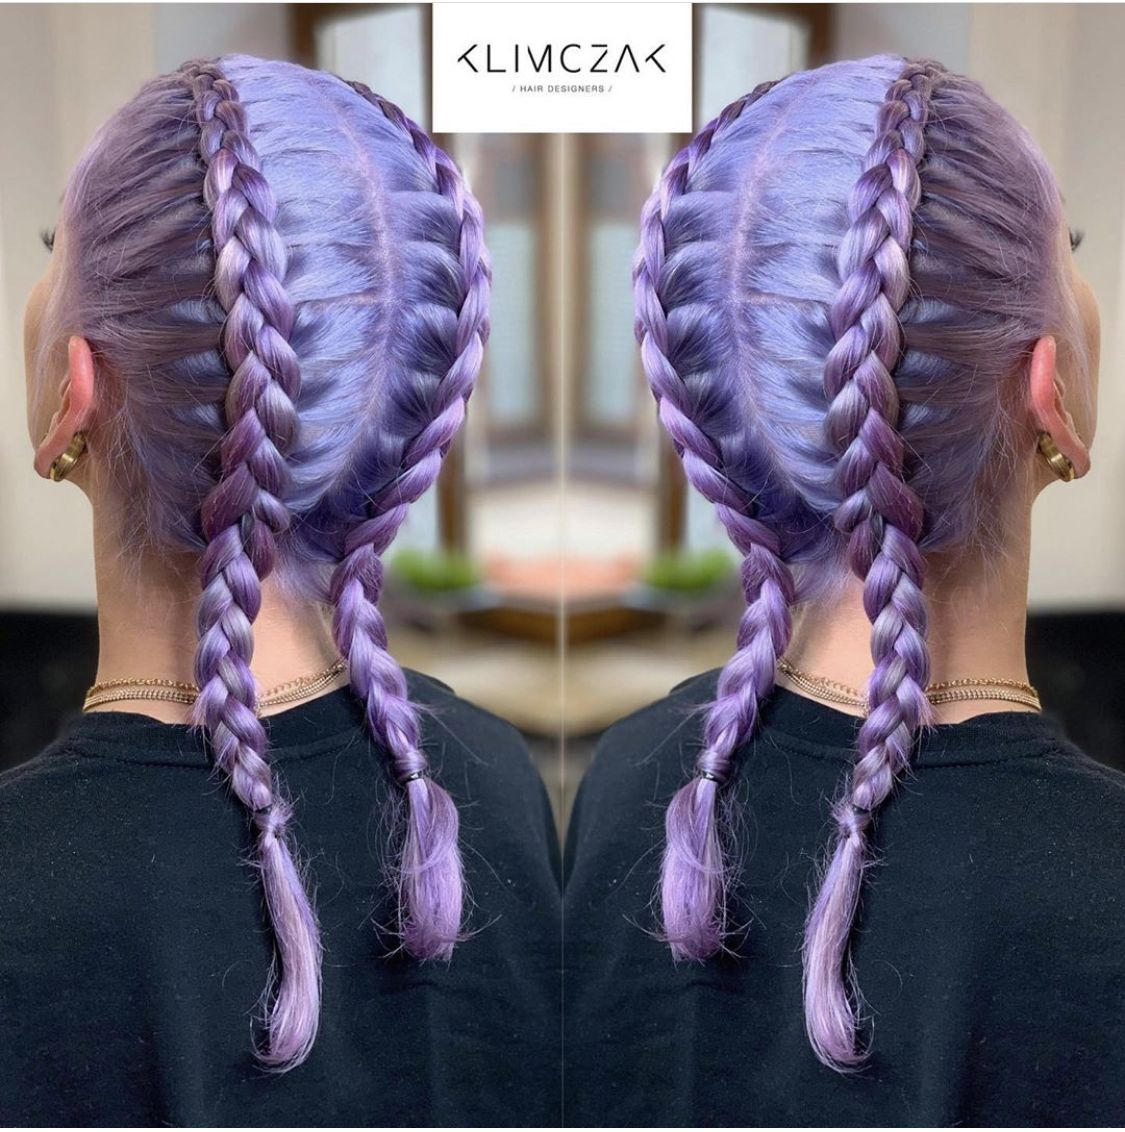 Klimczakhairdesigners Womens Hairstyles Hair Styles Hair